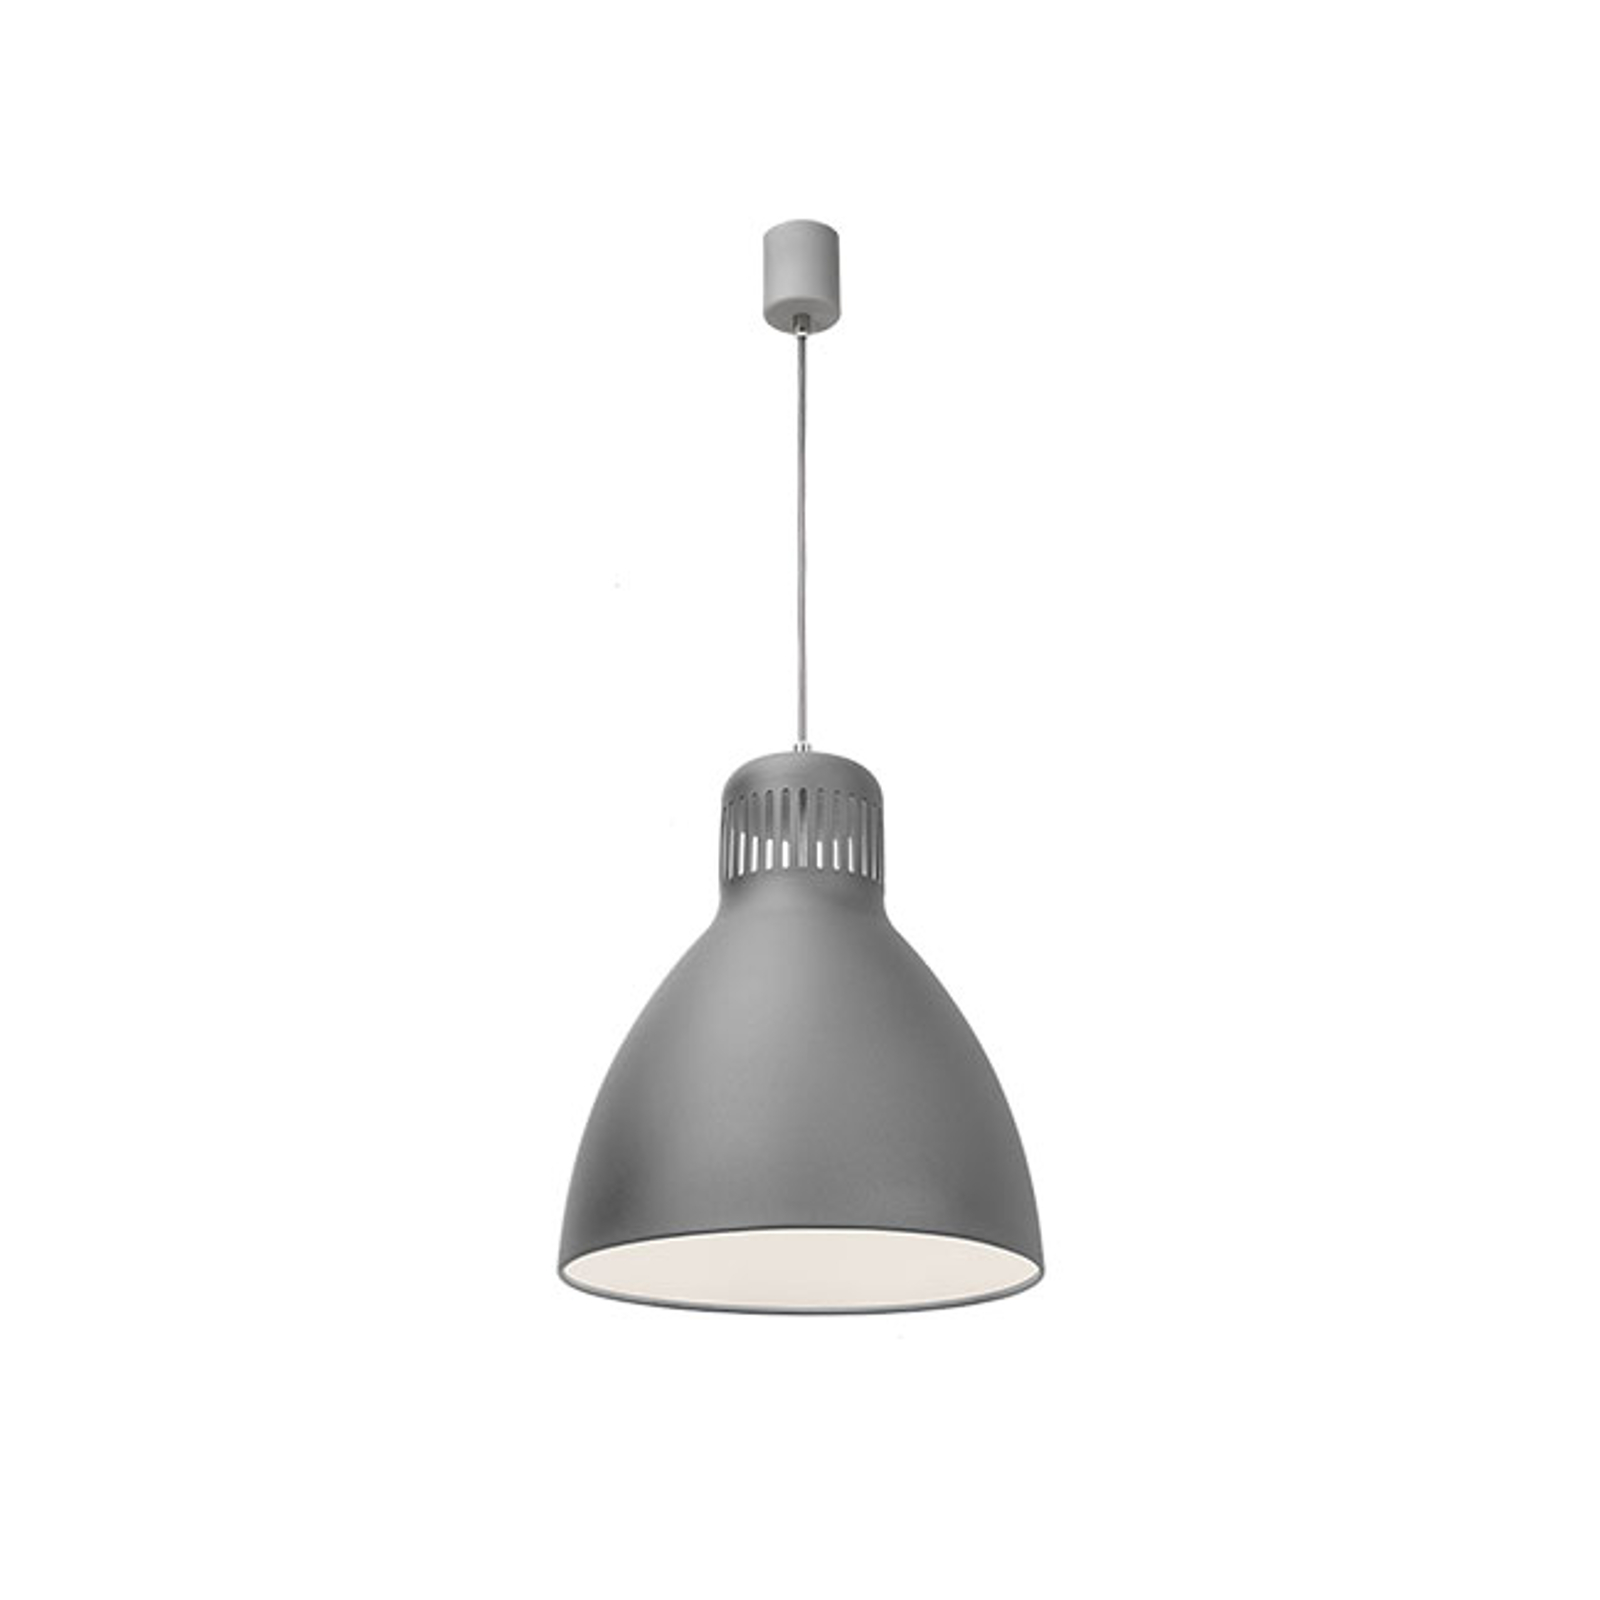 L-1 LED-hengelampe, DALI-dimbar 4000 K, grå